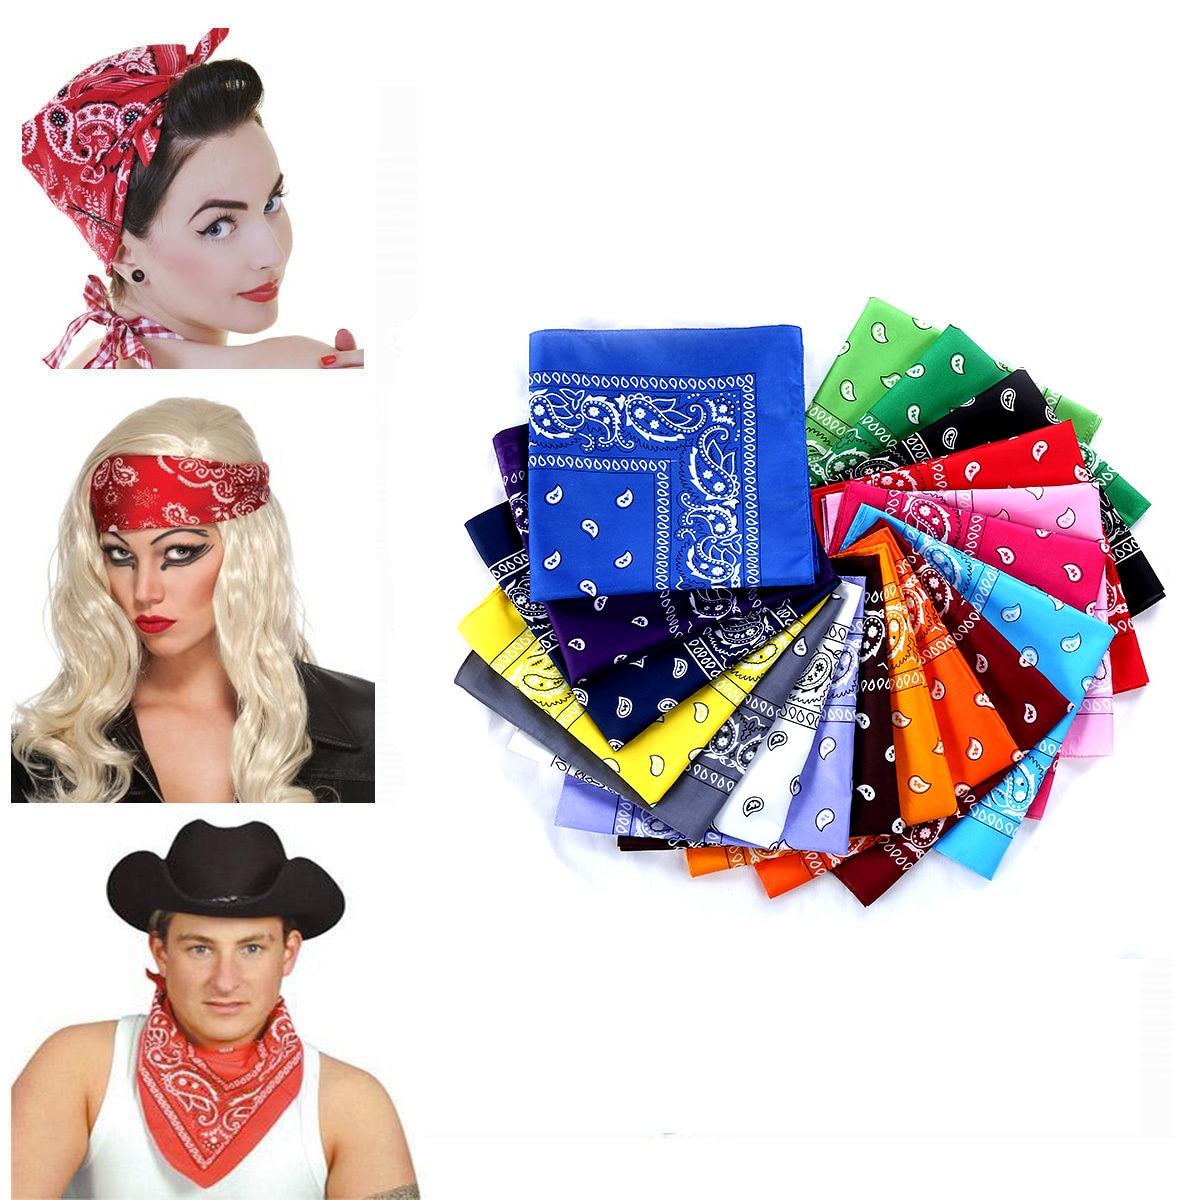 All Season Fits Unisex Scarf Gothic Pattern Pritned Cotton Bandana Head Wrap Headband Durag Bandanna Summer Bikers' Scarf Mask